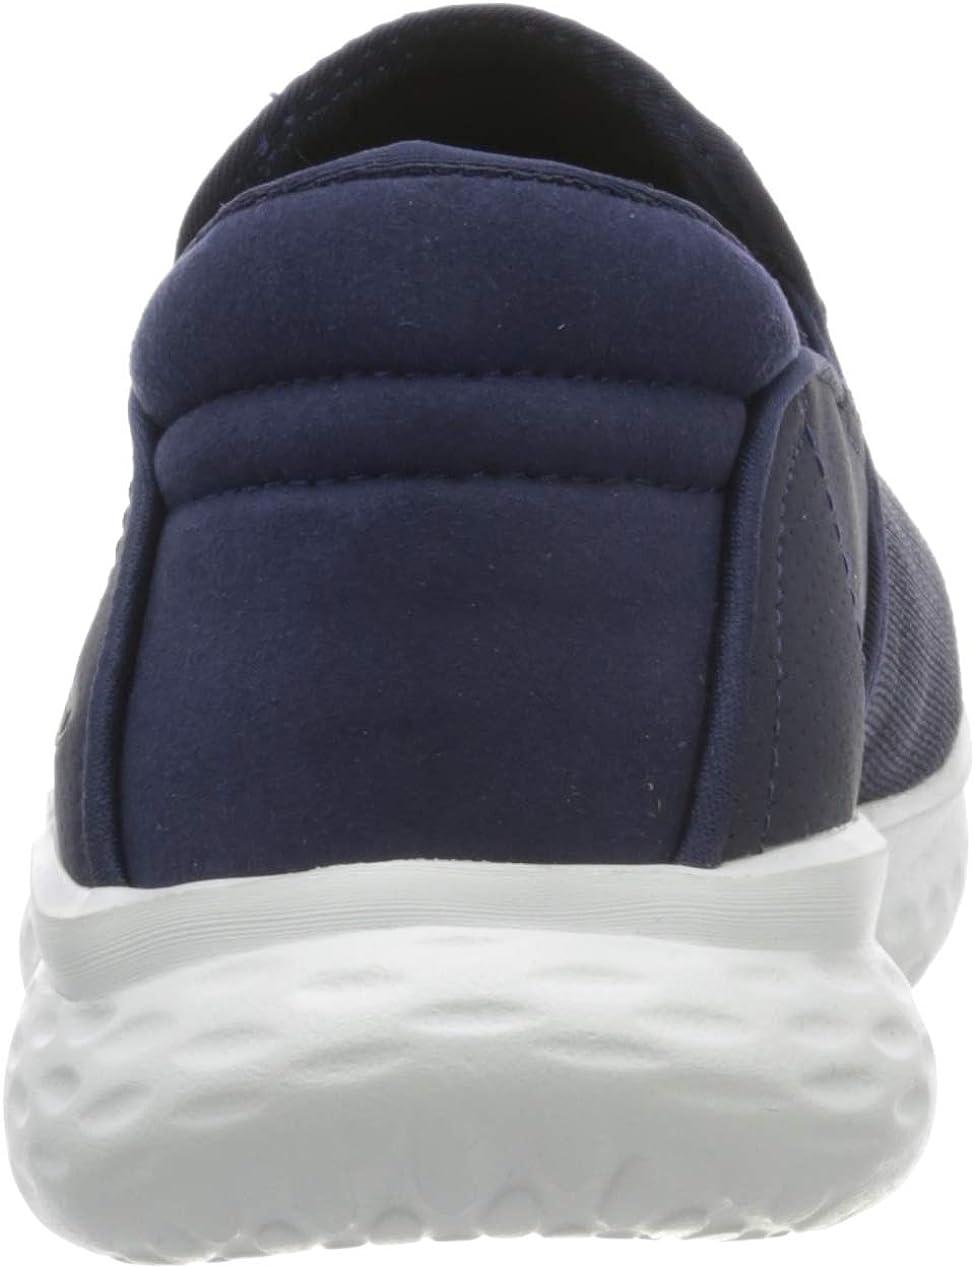 MBT Modena Slip on W, Sneakers Basses Femme Bleu Navy 12y